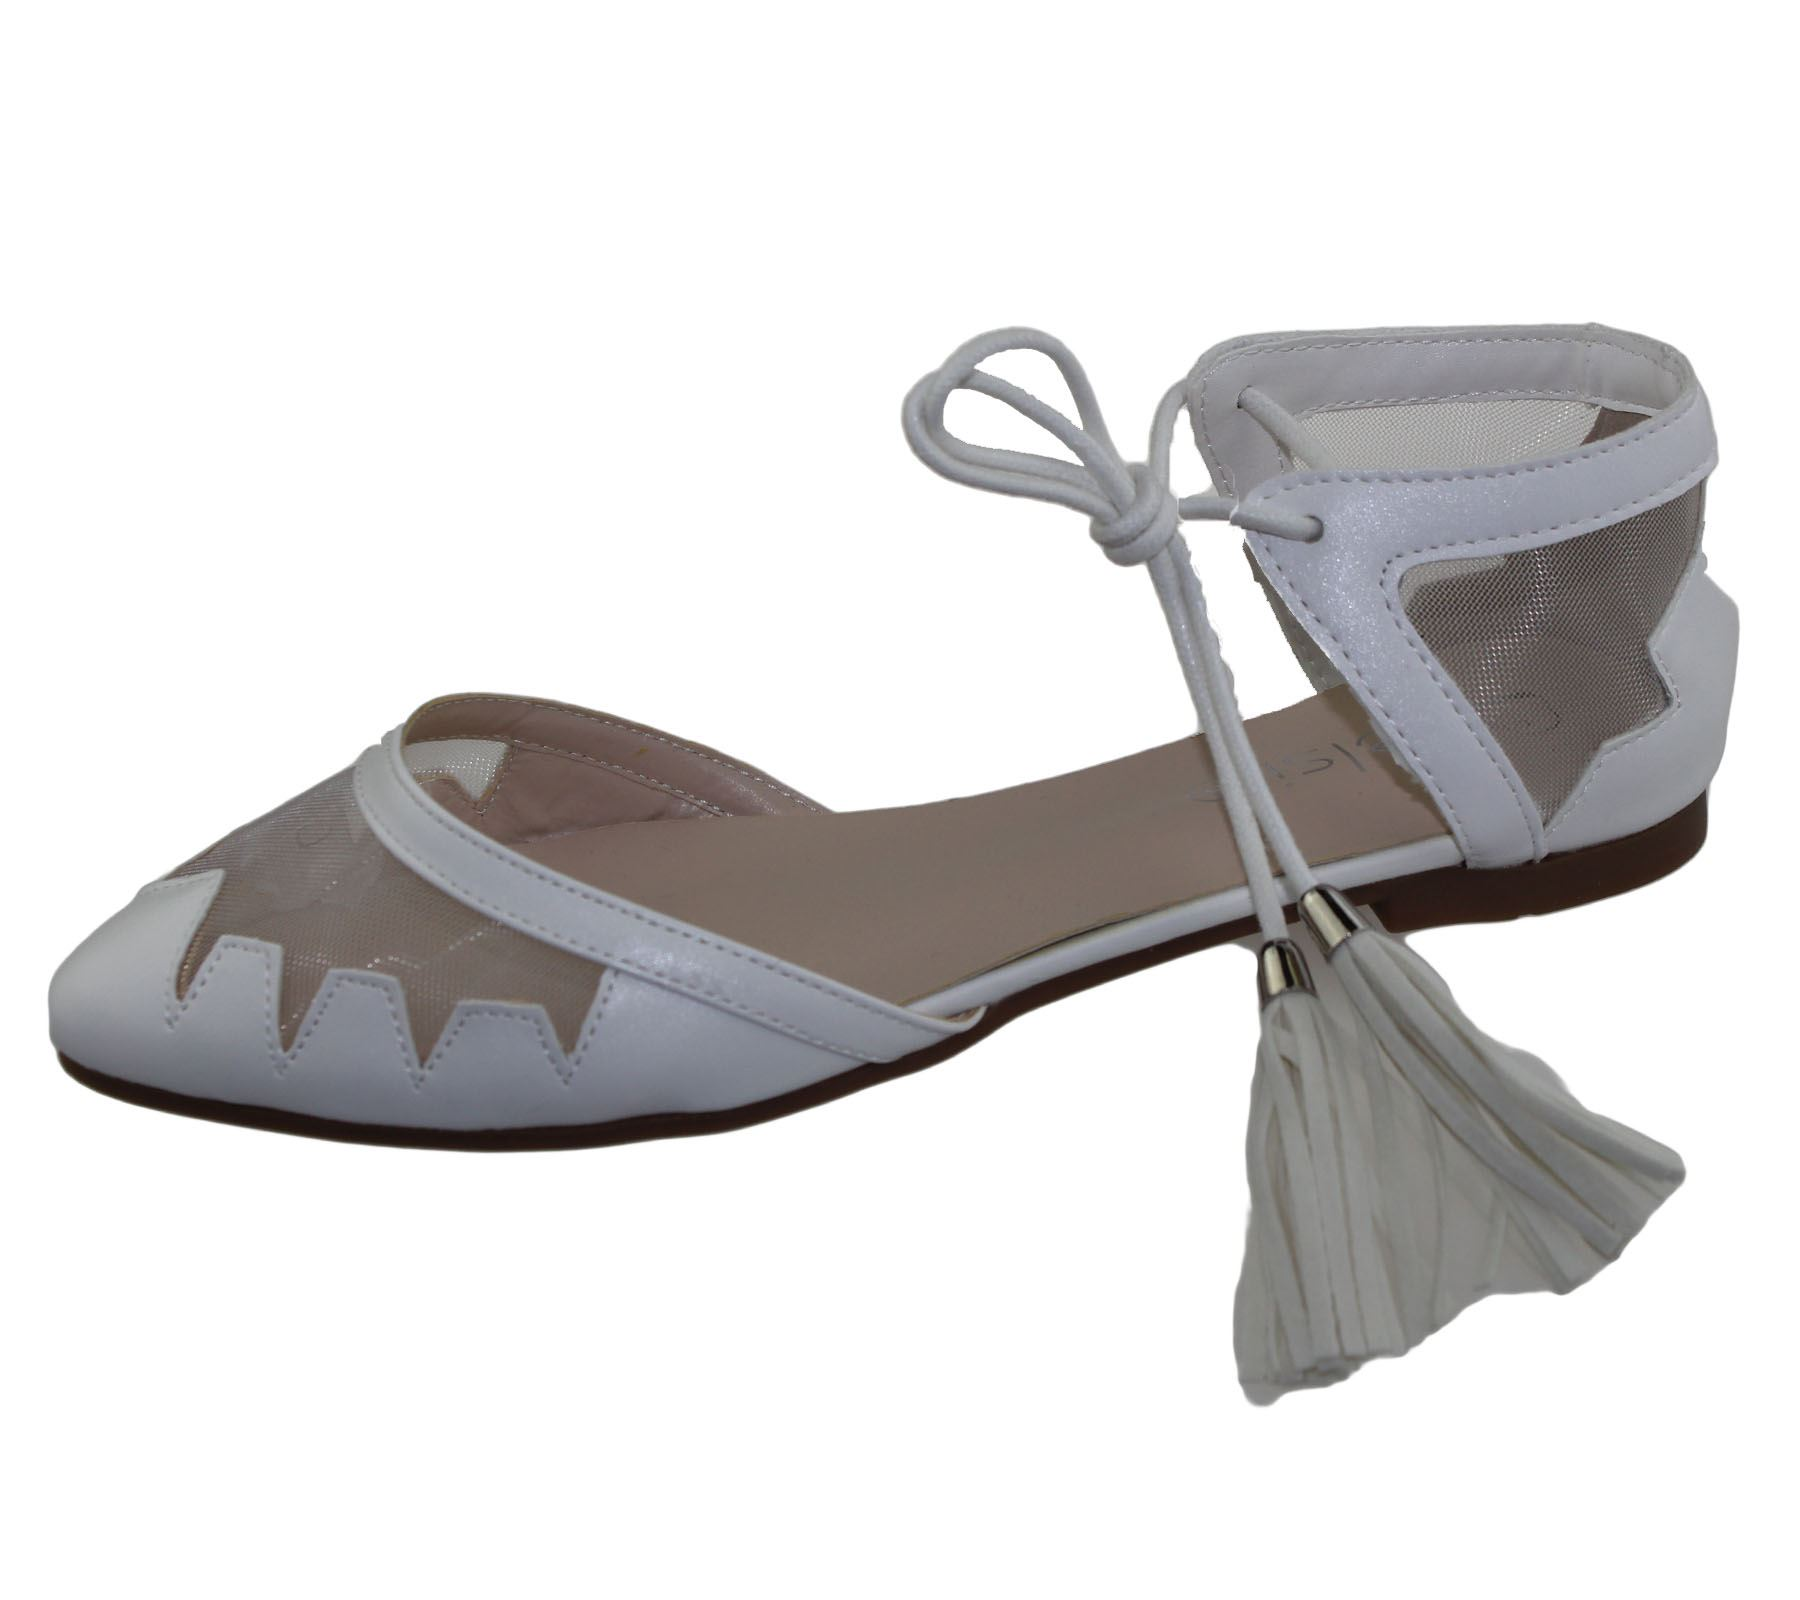 Womens-Flat-Ballerina-Dolly-Pumps-Ballet-Ladies-Summer-Mesh-Tassel-Shoes-Sandals thumbnail 19